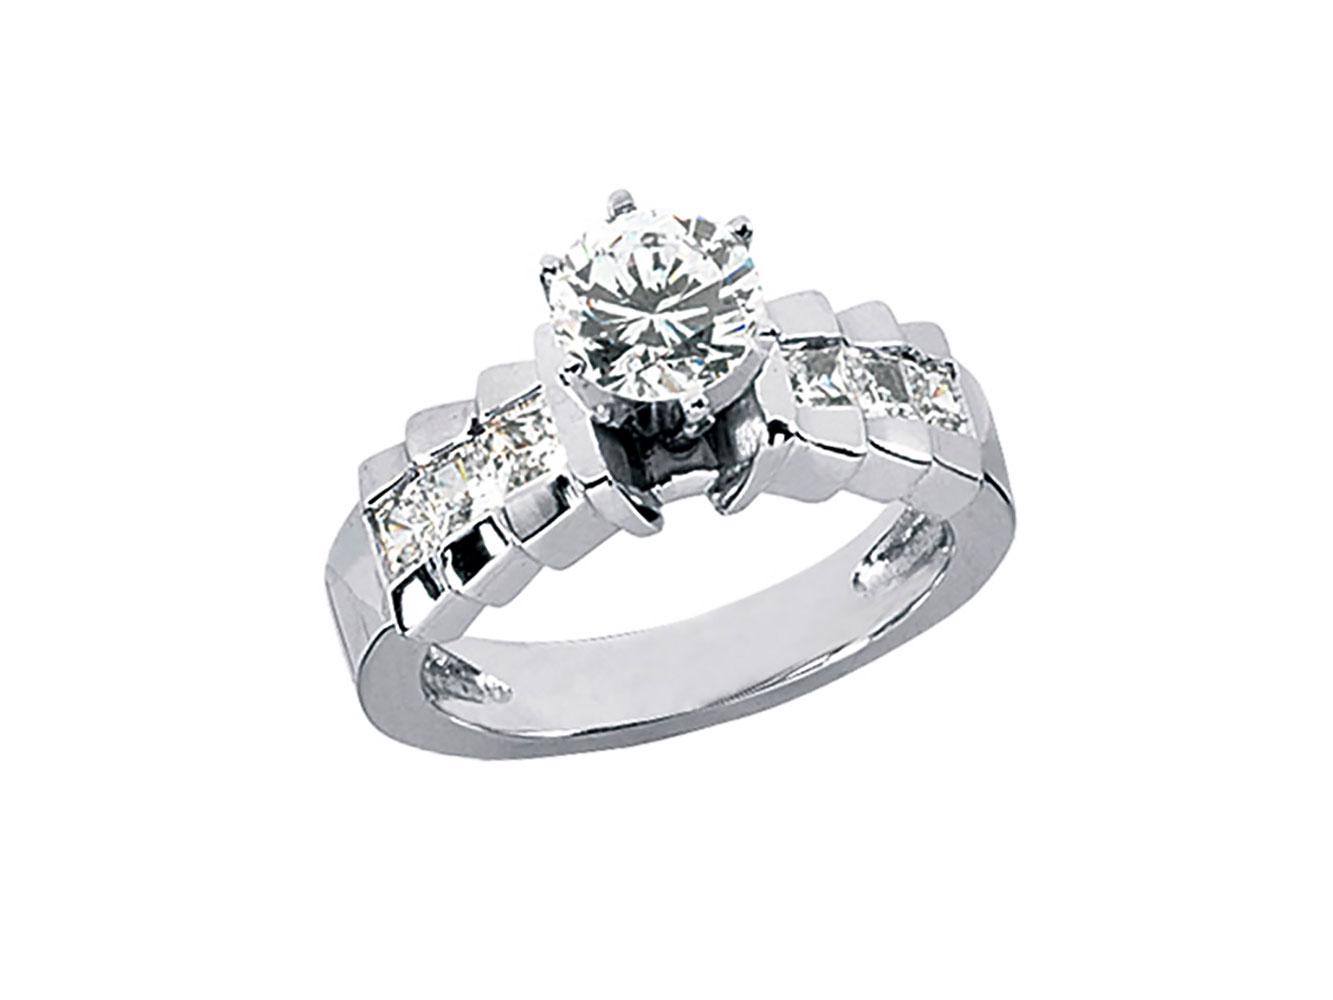 96320377bc09d Genuine 1.50Ct Round Princess Cut Diamond Engagement Ring Solid 14k ...